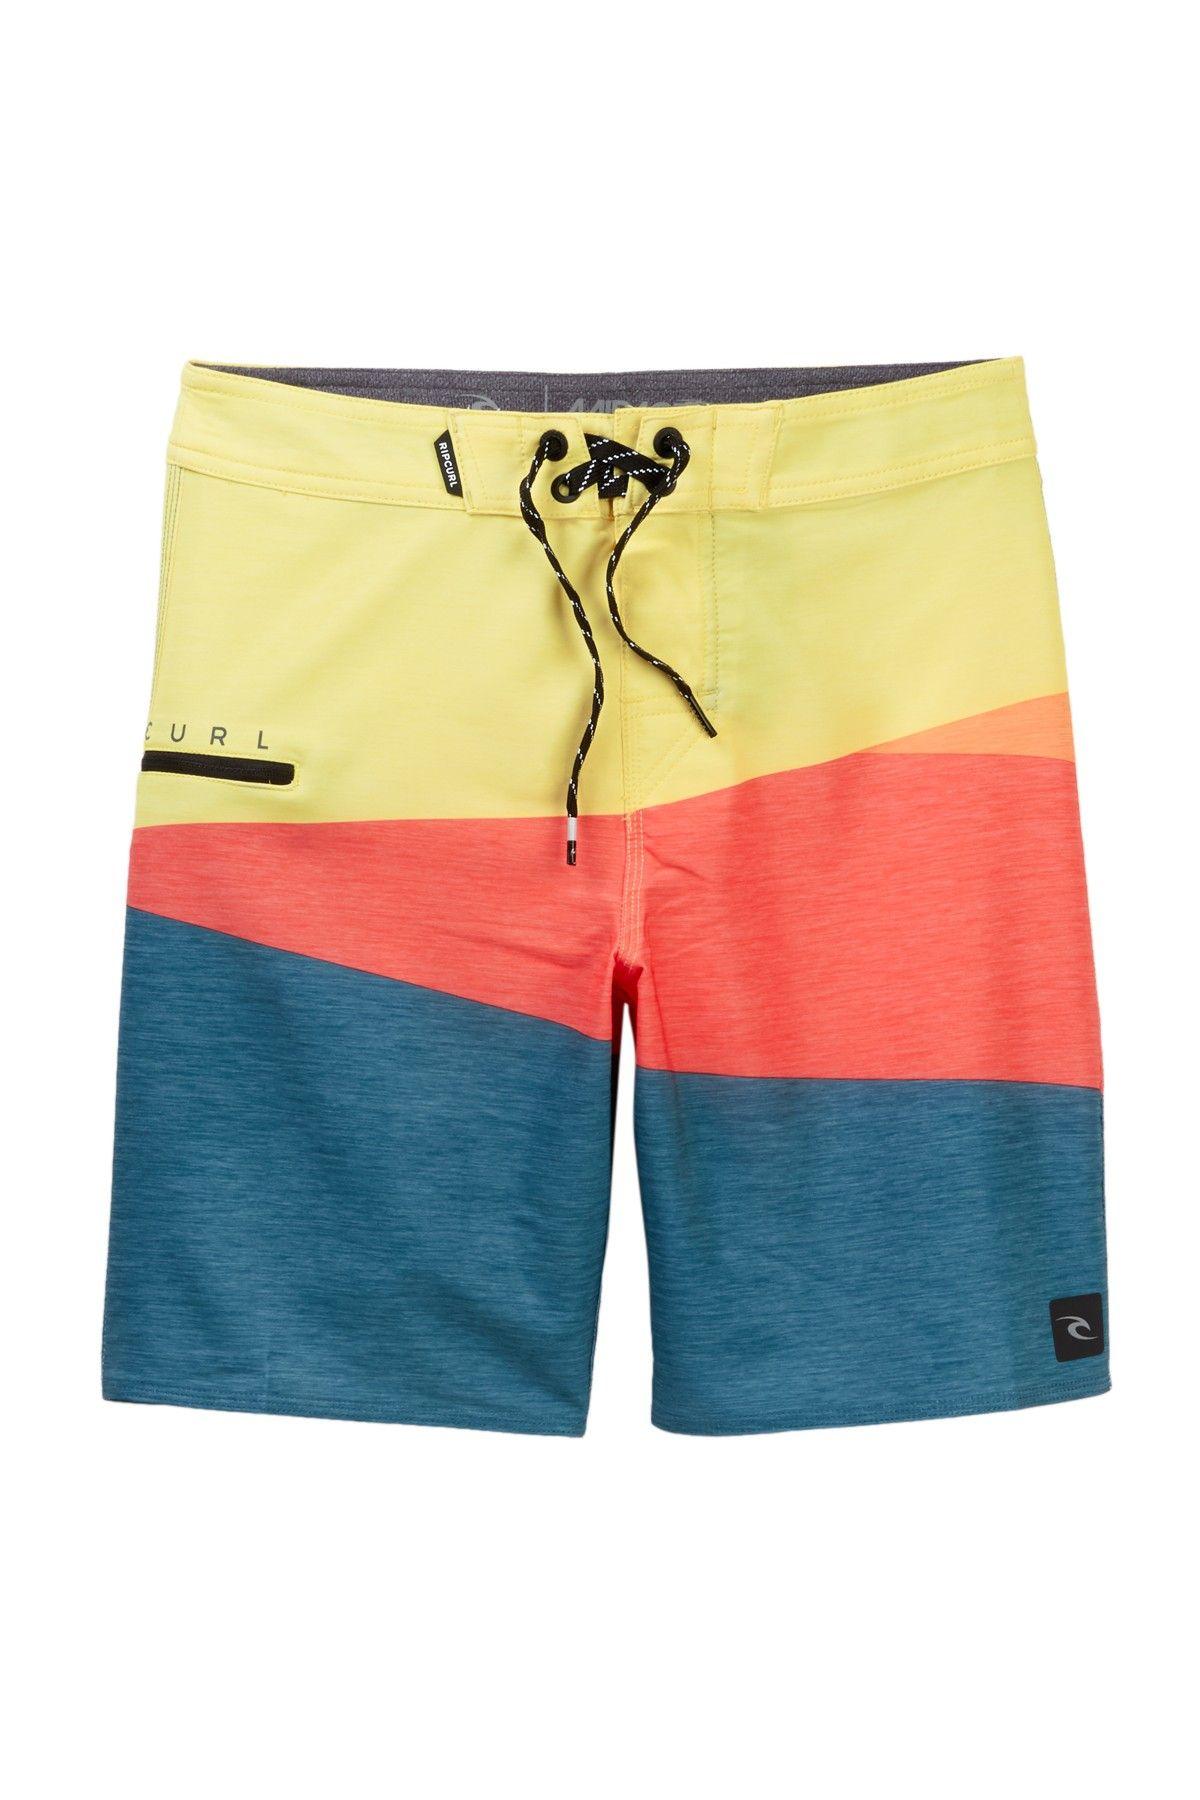 Mirage Edge Board Shorts (Big Boys) Mat Man 4e54bf96a29